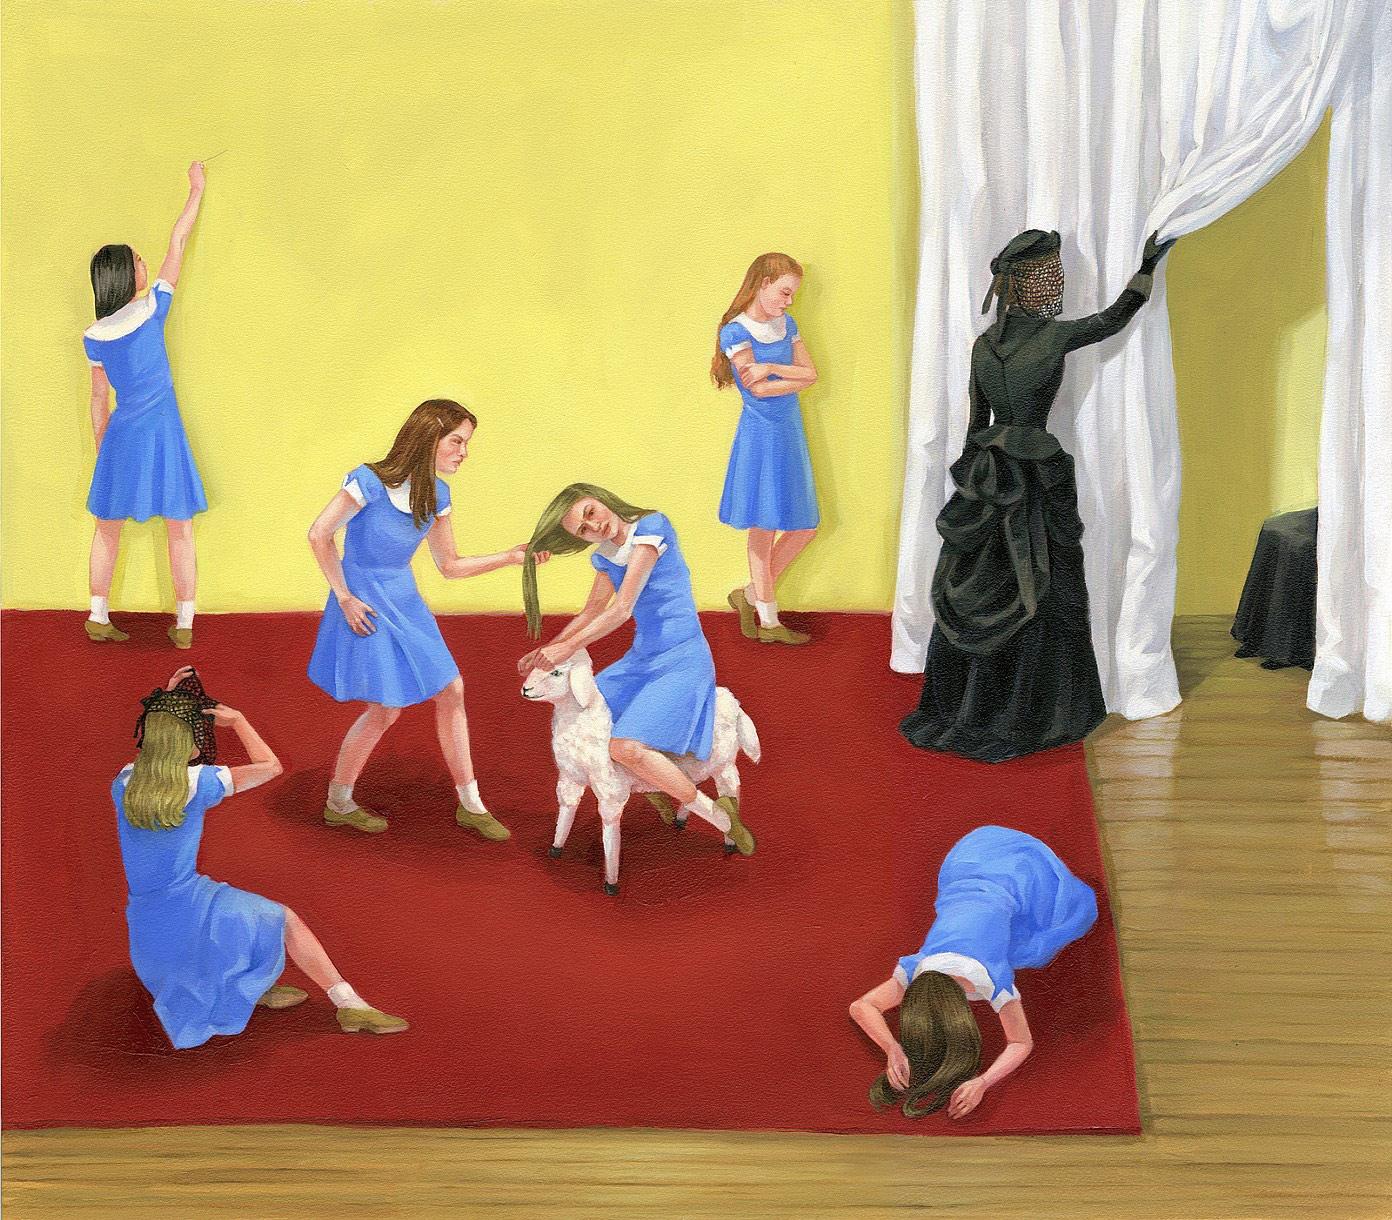 Zoe Hawk's Paintings Celebrate Feminine Identity 14